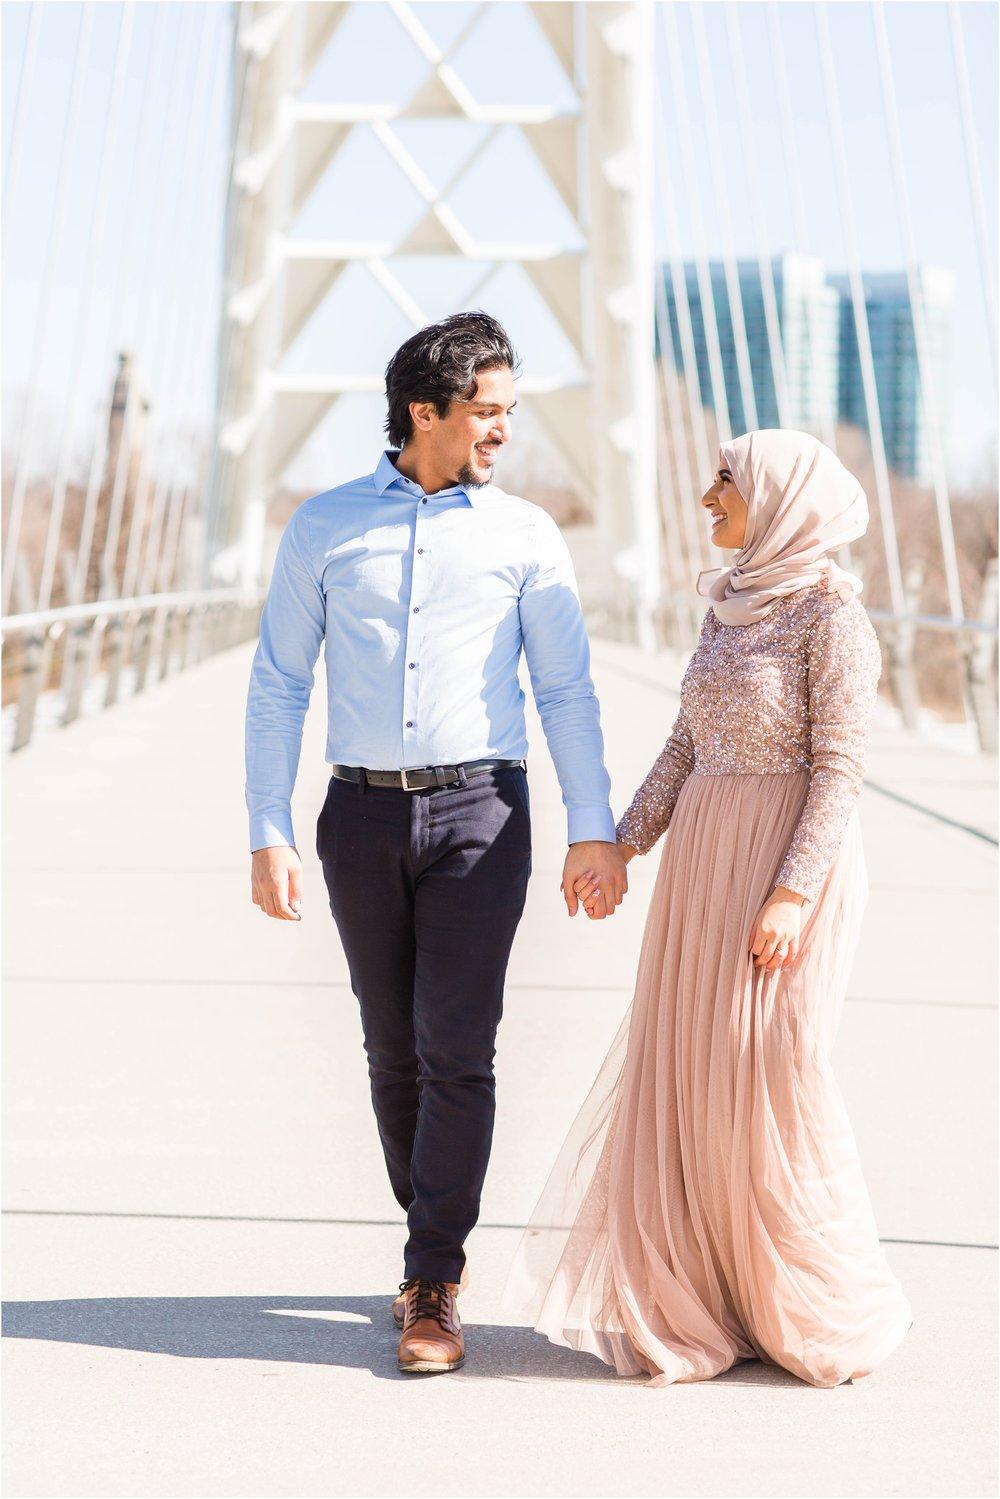 Humber-Bay-Bridge-Distillery-District-Engagement-Session-Toronto-Mississauga-Brampton-Scarborough-GTA-Pakistani-Indian-Wedding-Engagement-Photographer-Photography_0001.jpg